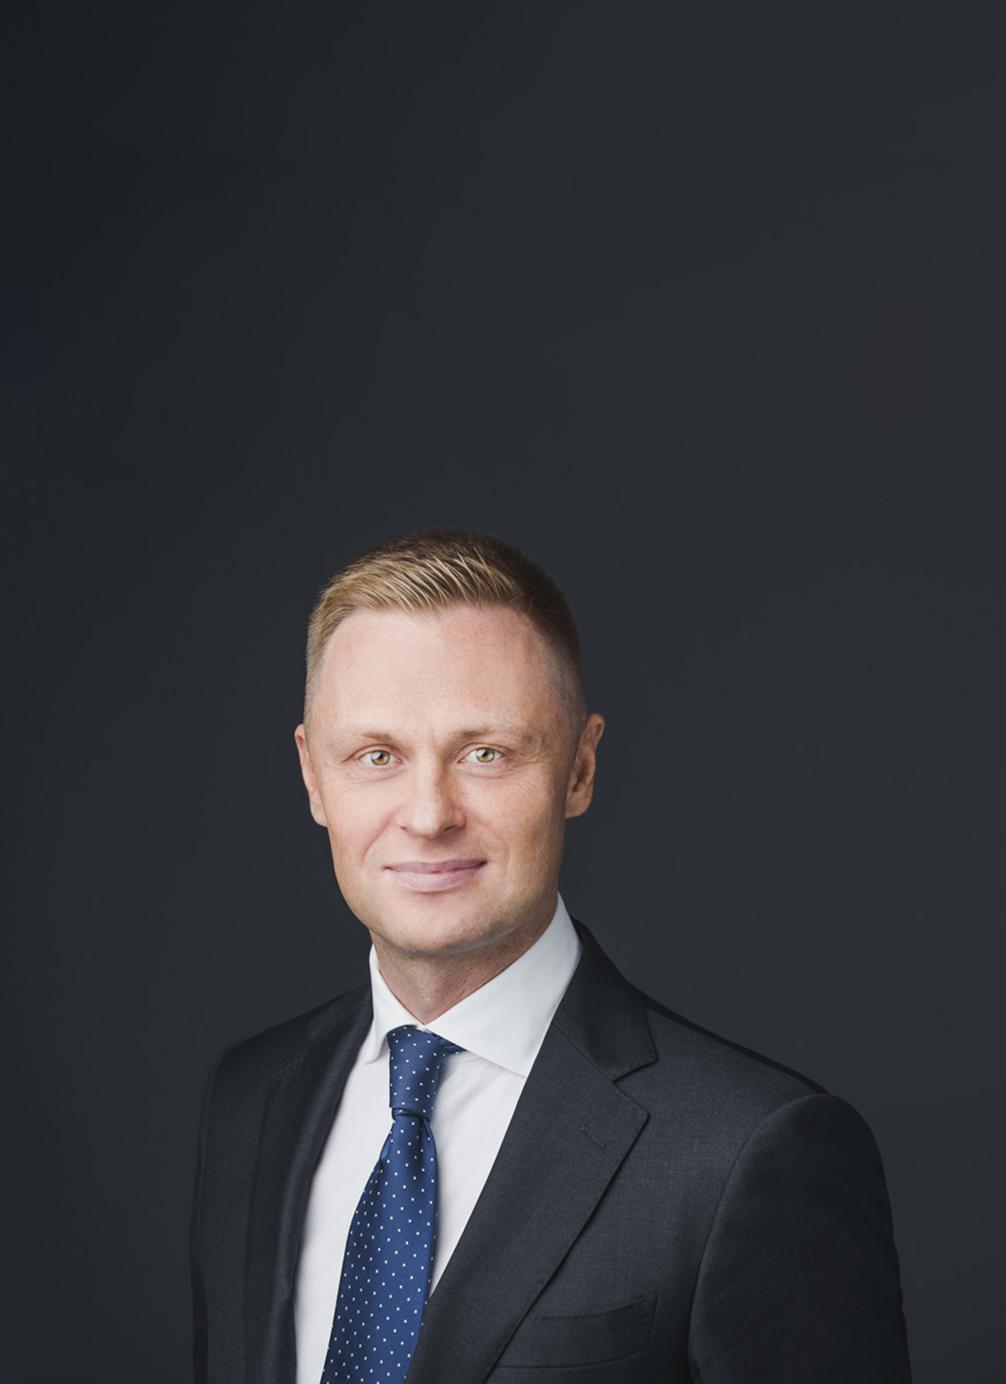 Juozas Buitkus, Mecon, Chief Operating Officer